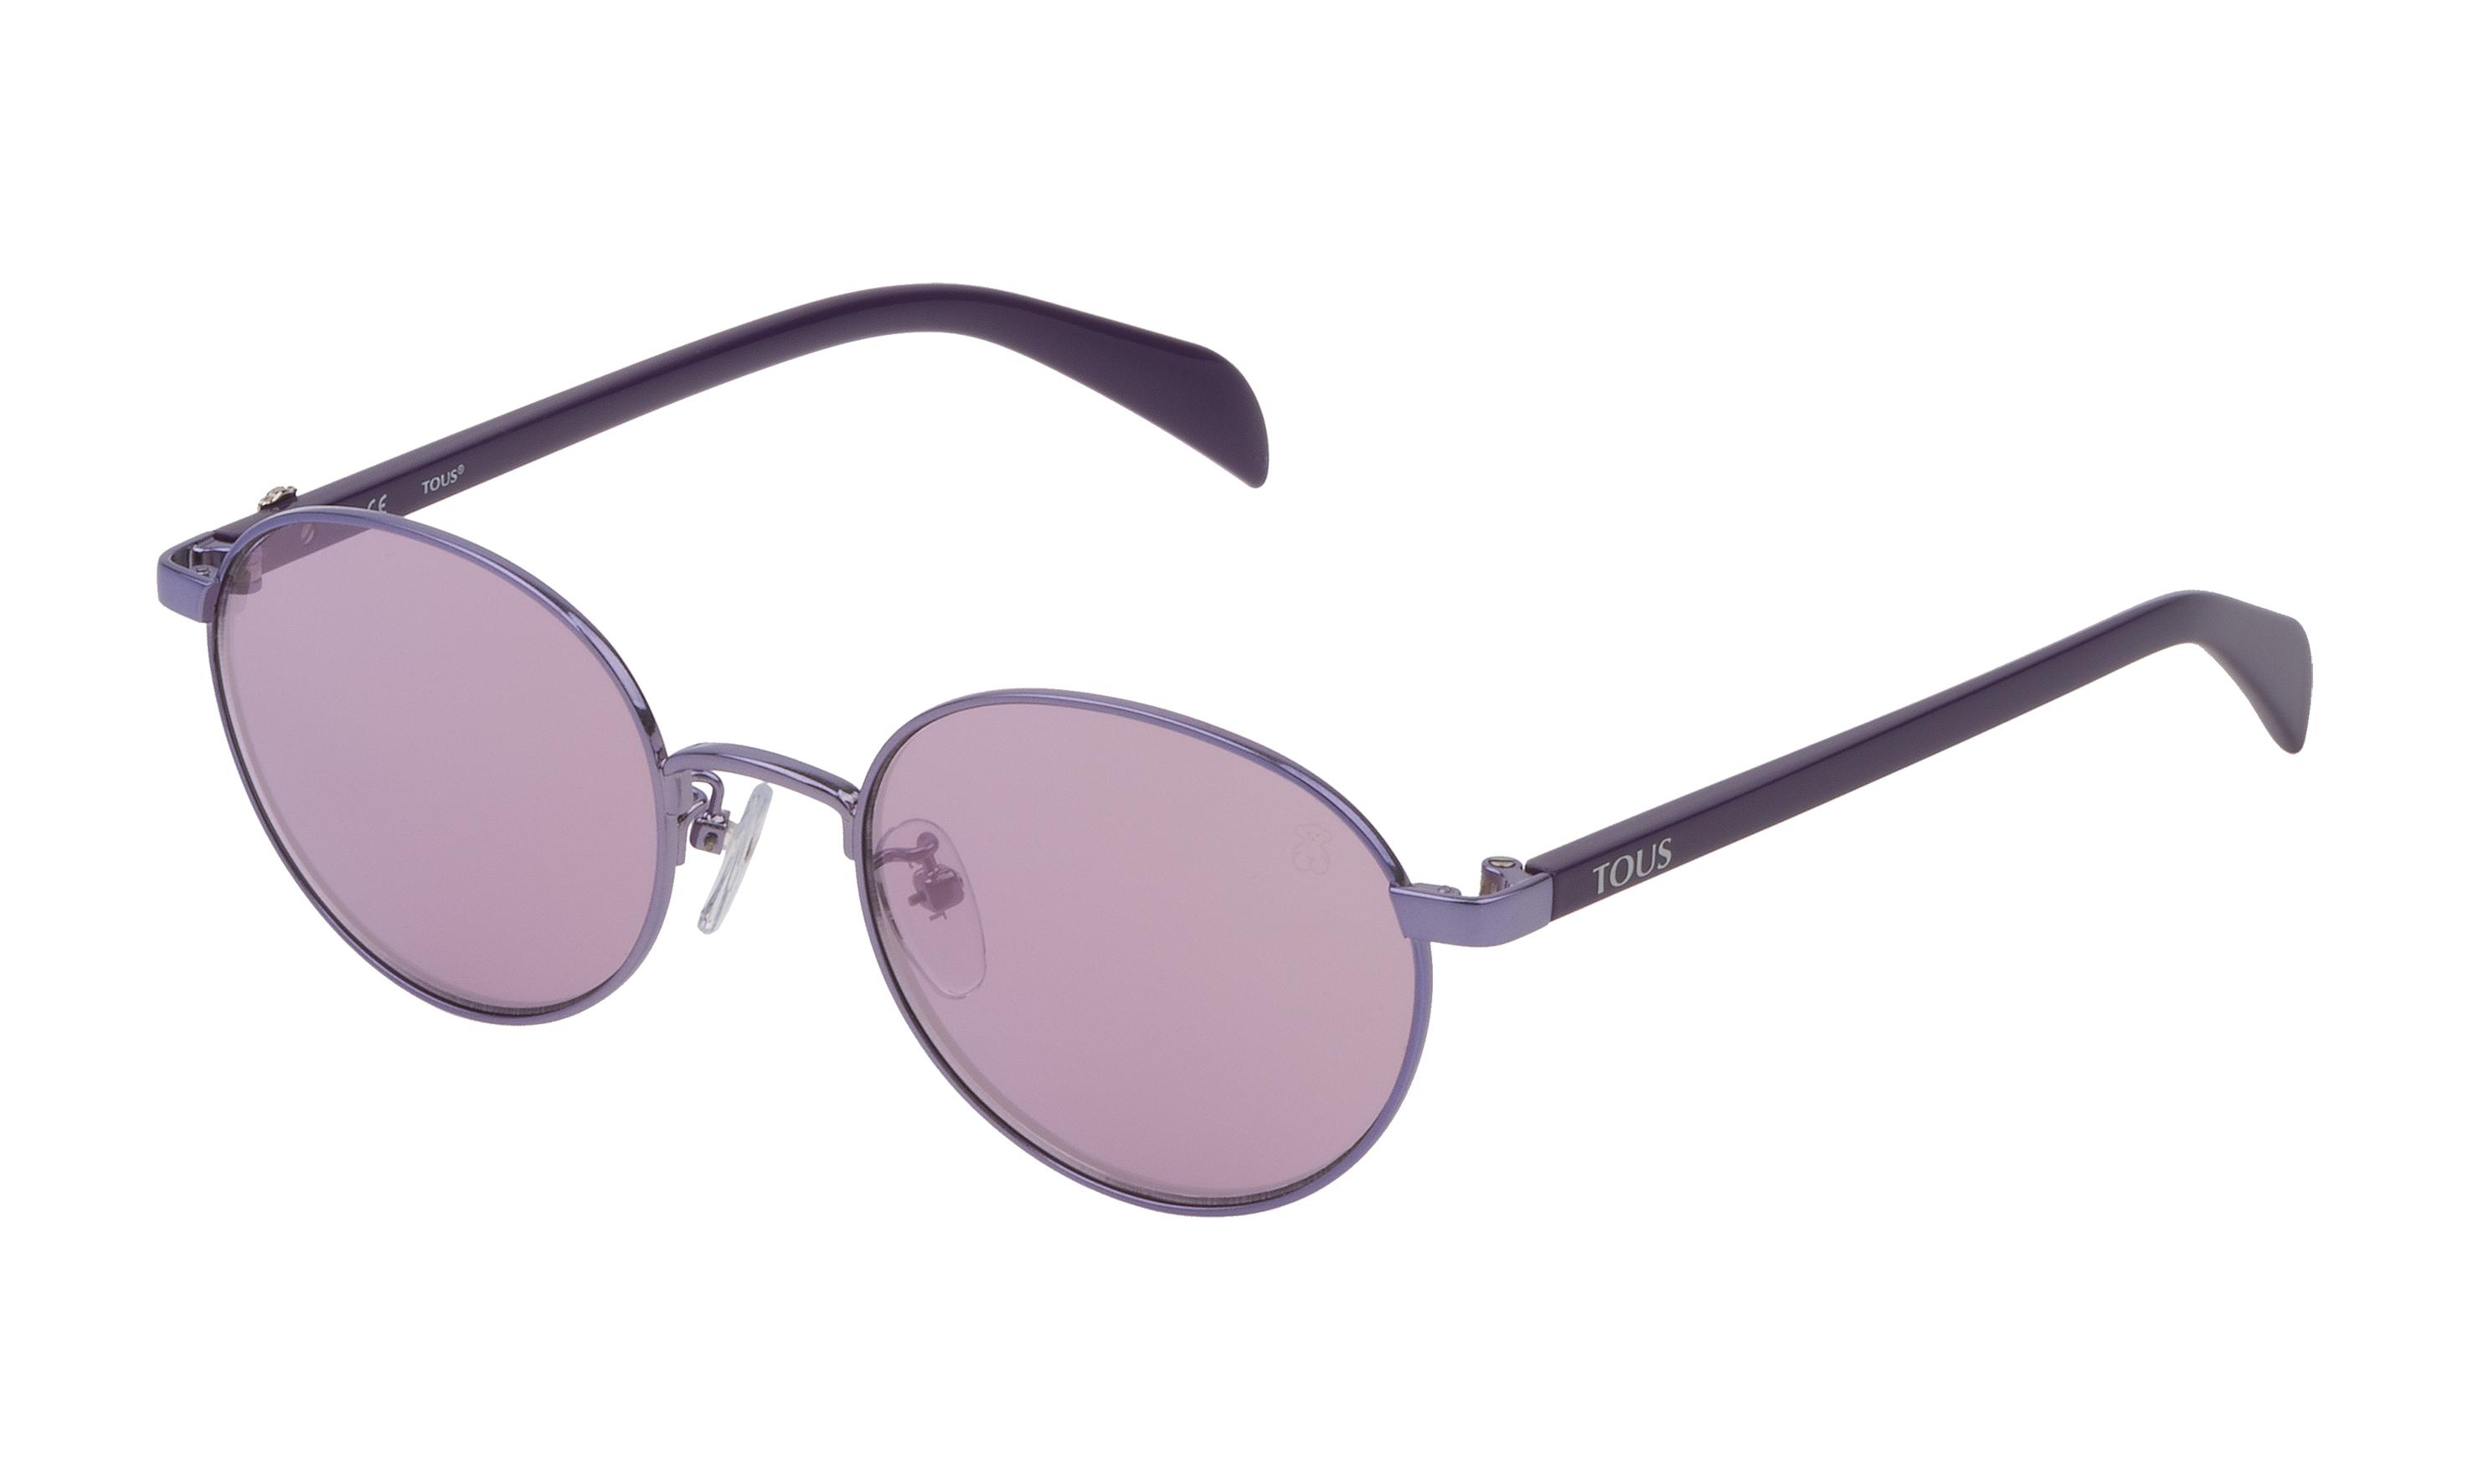 TOUS STO 393 08RB  Gafas de sol Mujer